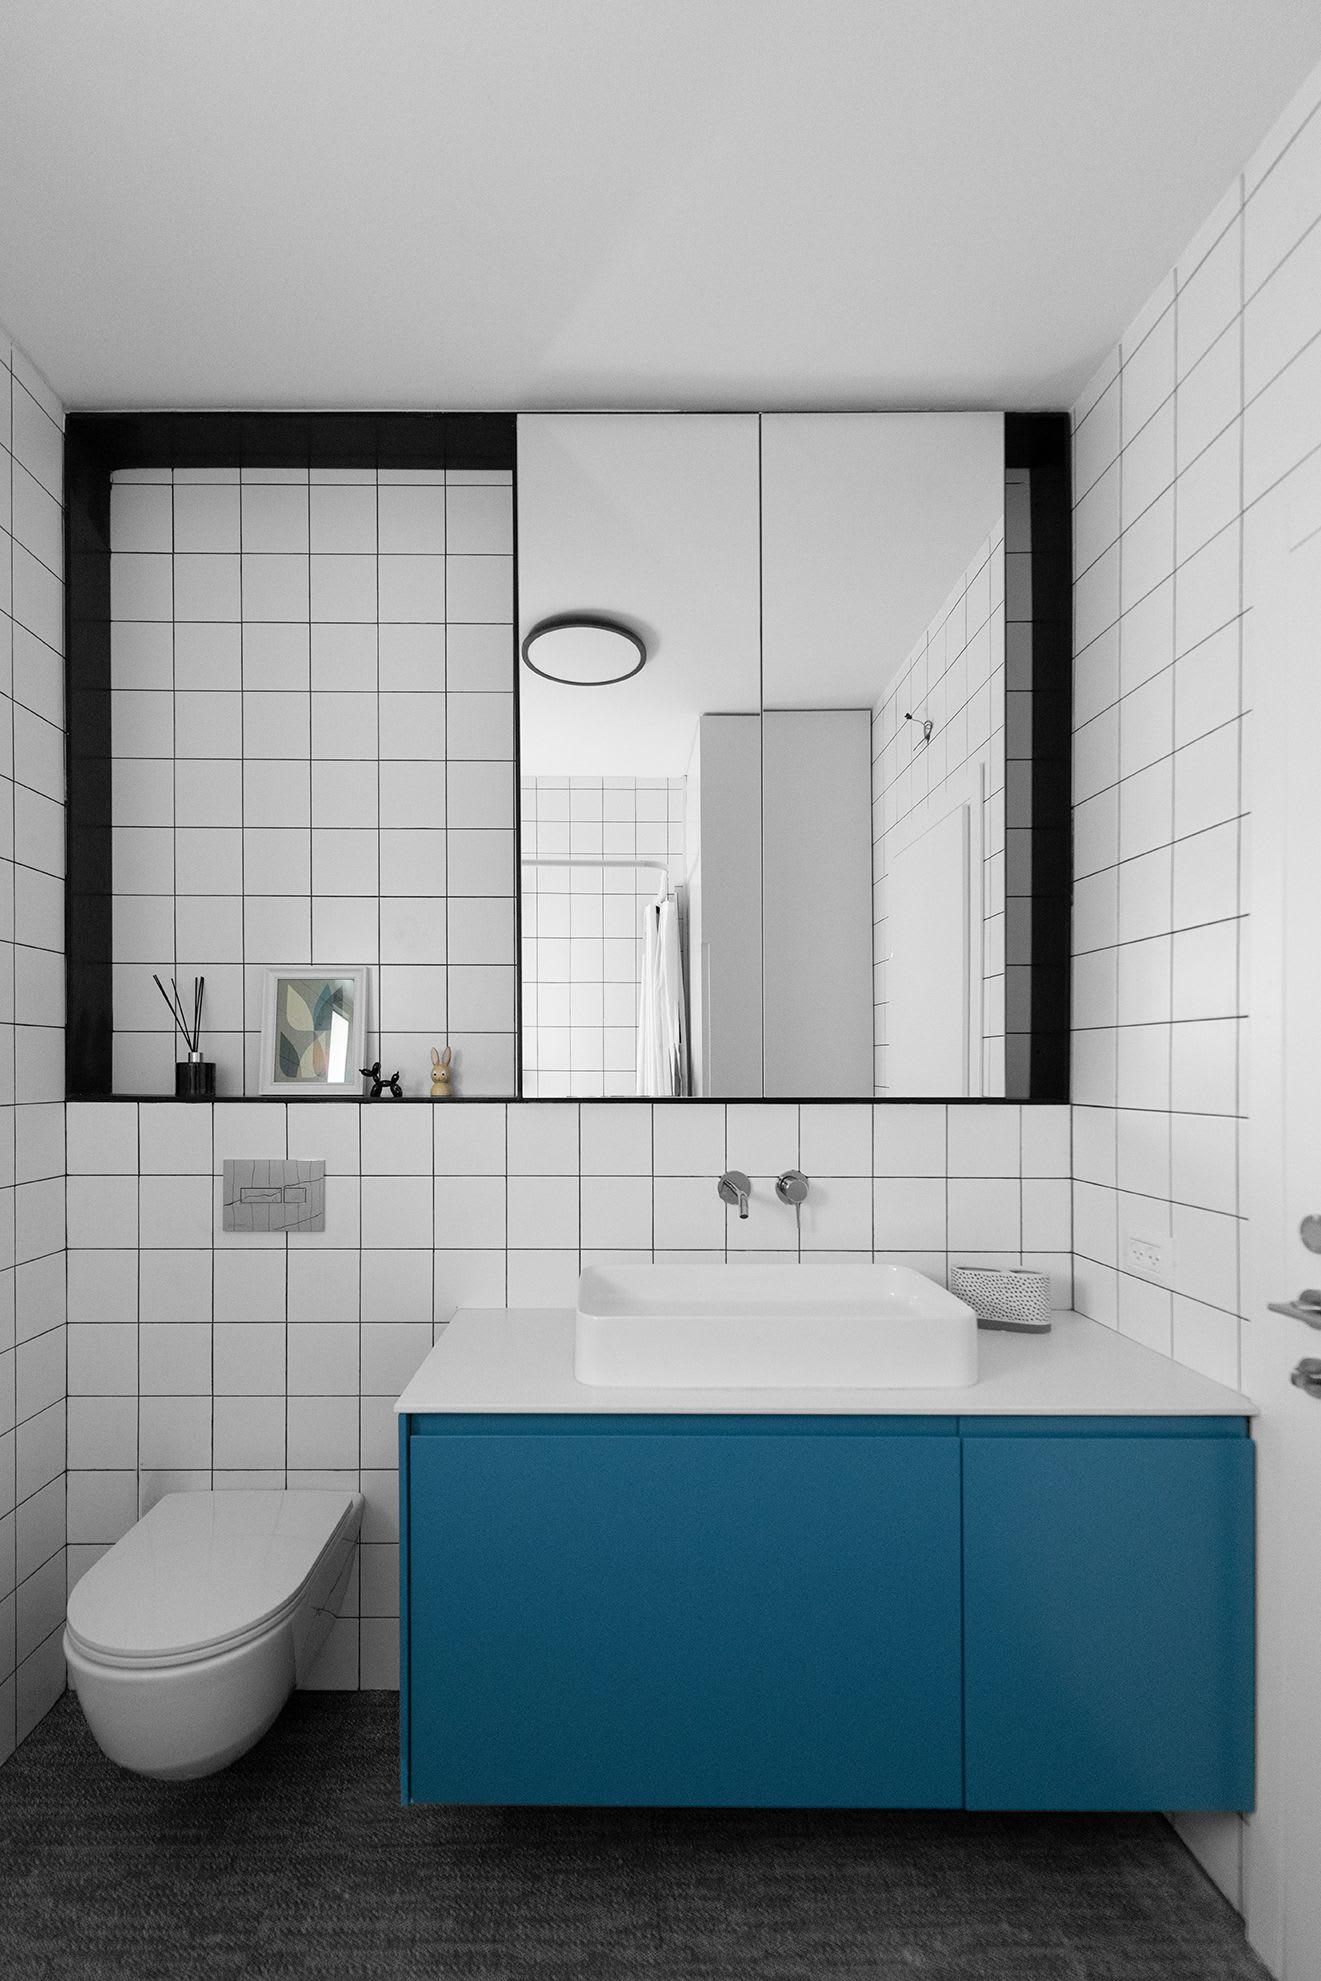 Interior Design by STUDIO GAL GERBER seen at Private Residence, Herzliya, Herzliya - LG HOUSE